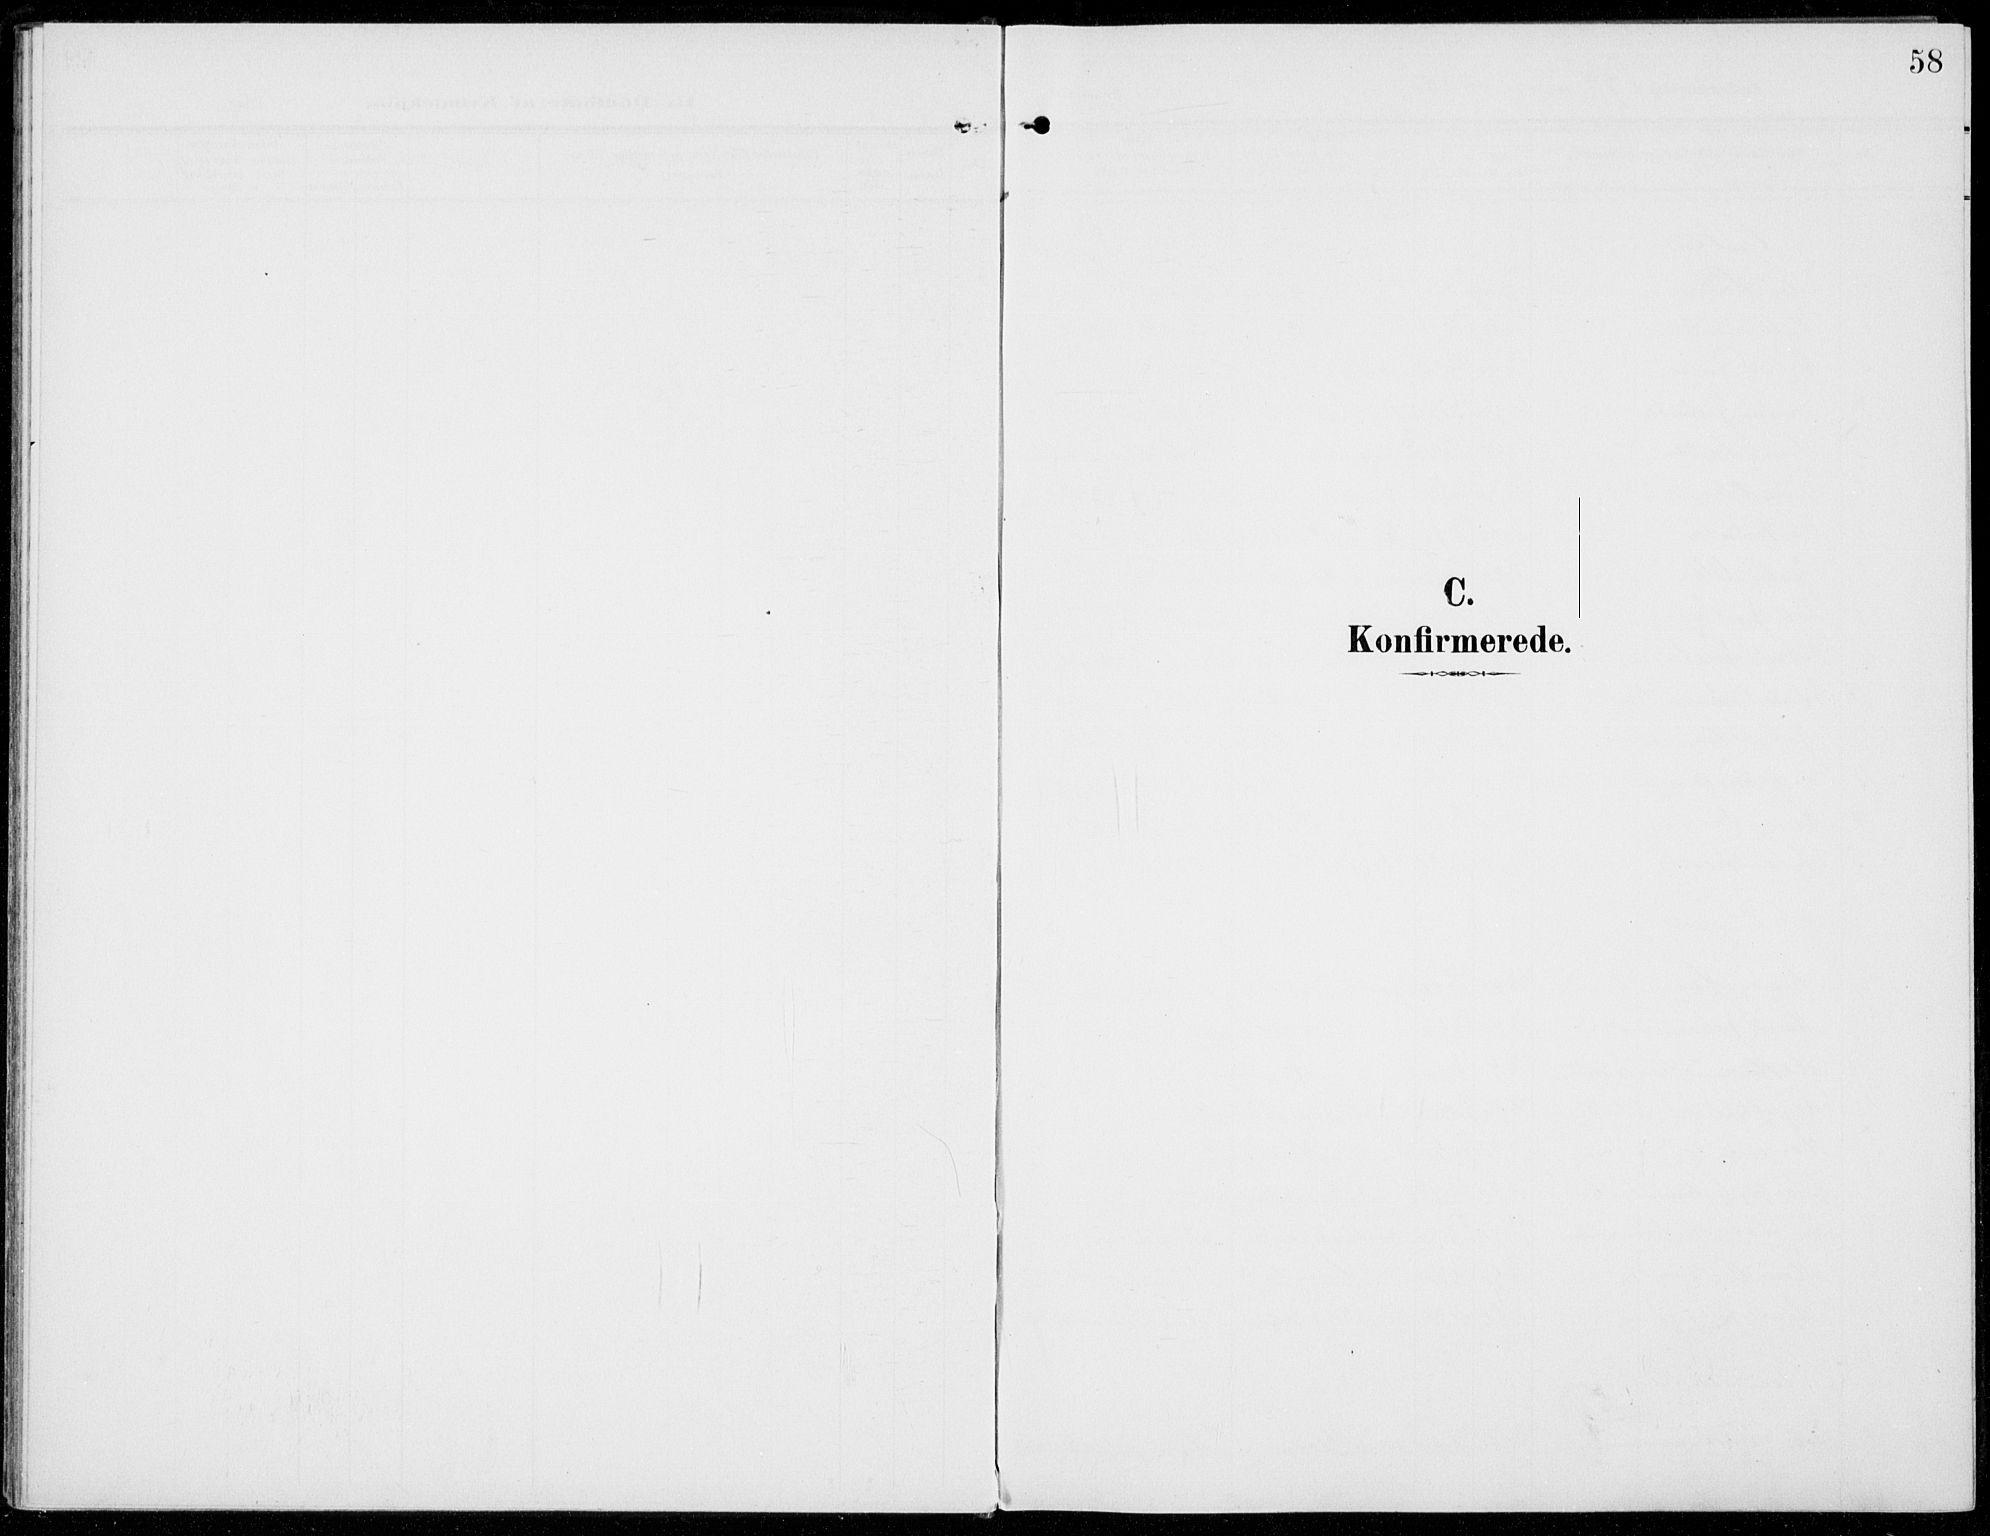 SAH, Sel prestekontor, Ministerialbok nr. 1, 1905-1922, s. 58